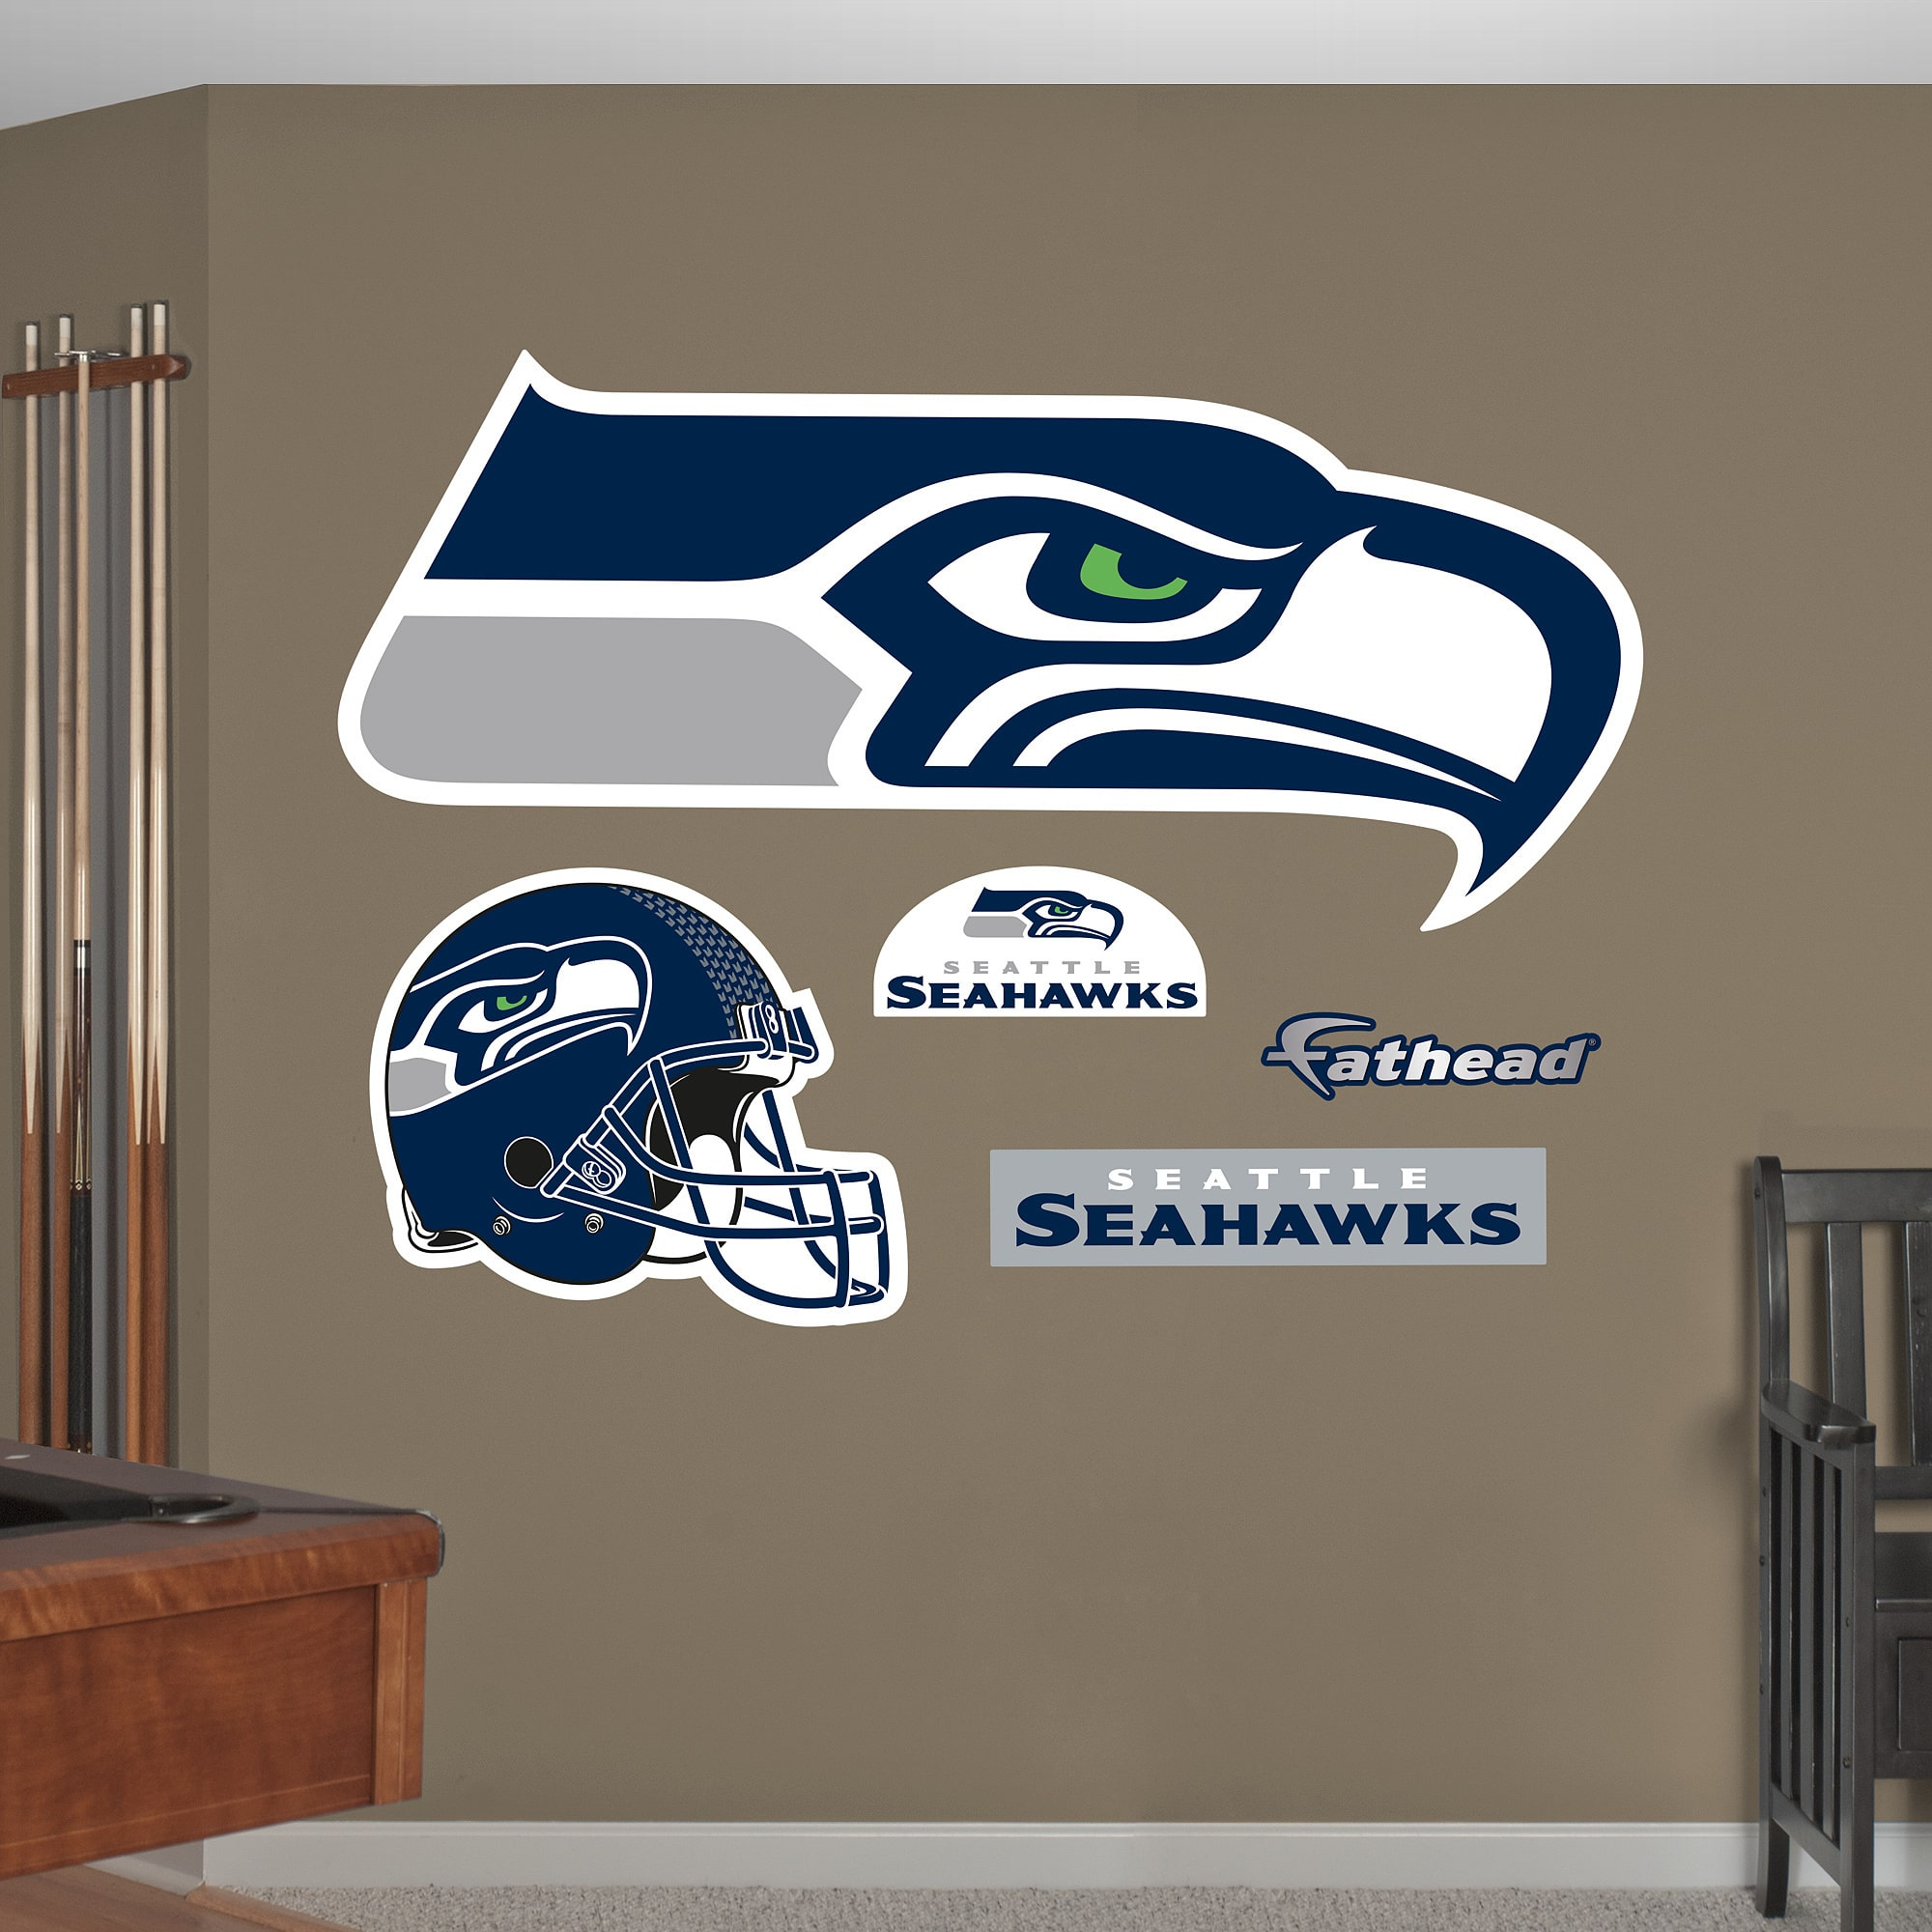 Fathead seattle seahawks logo wall decals walmart amipublicfo Images